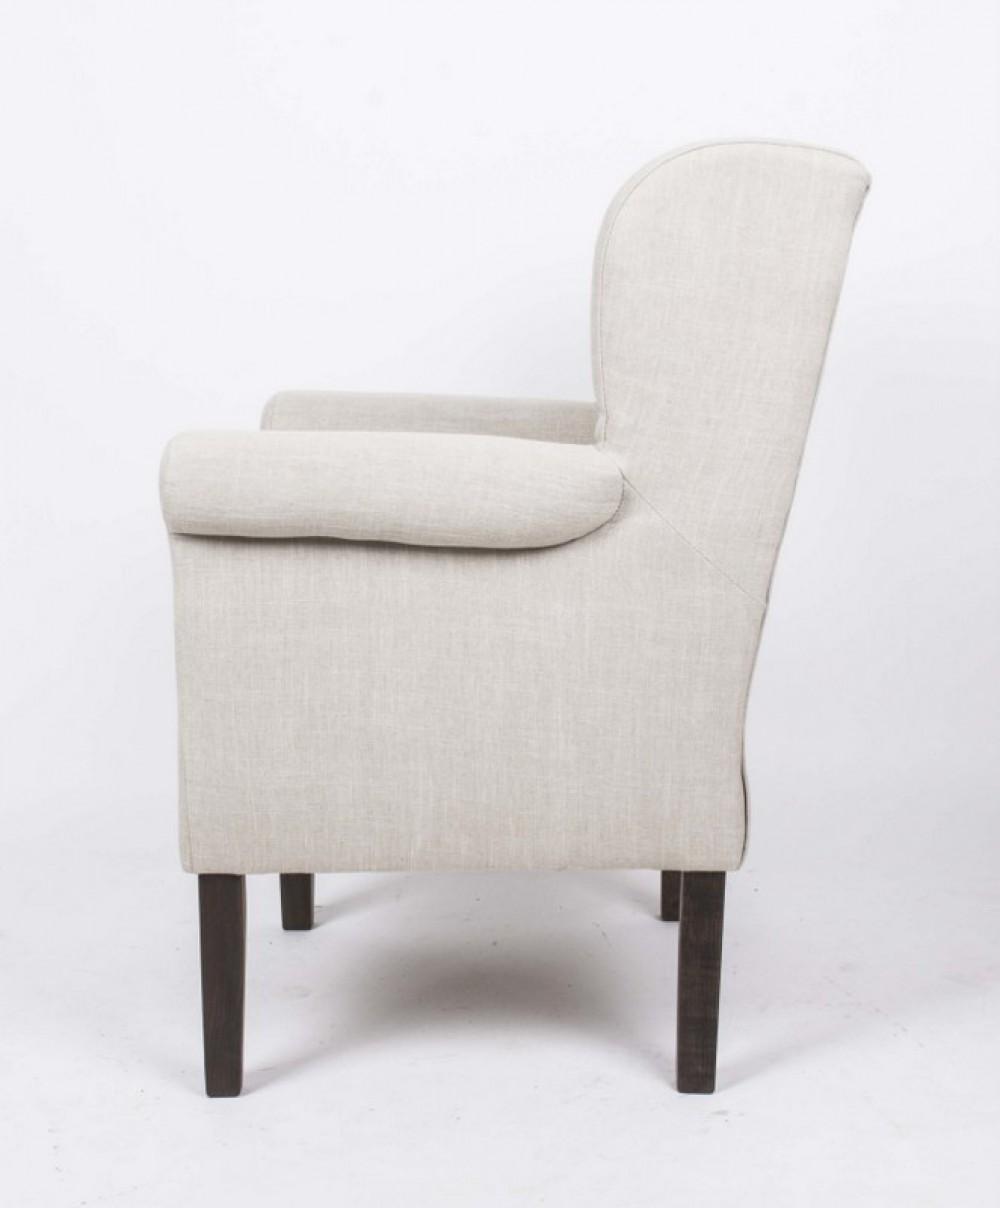 sessel kompakt ohrensessel im landhausstil farbe leinen. Black Bedroom Furniture Sets. Home Design Ideas